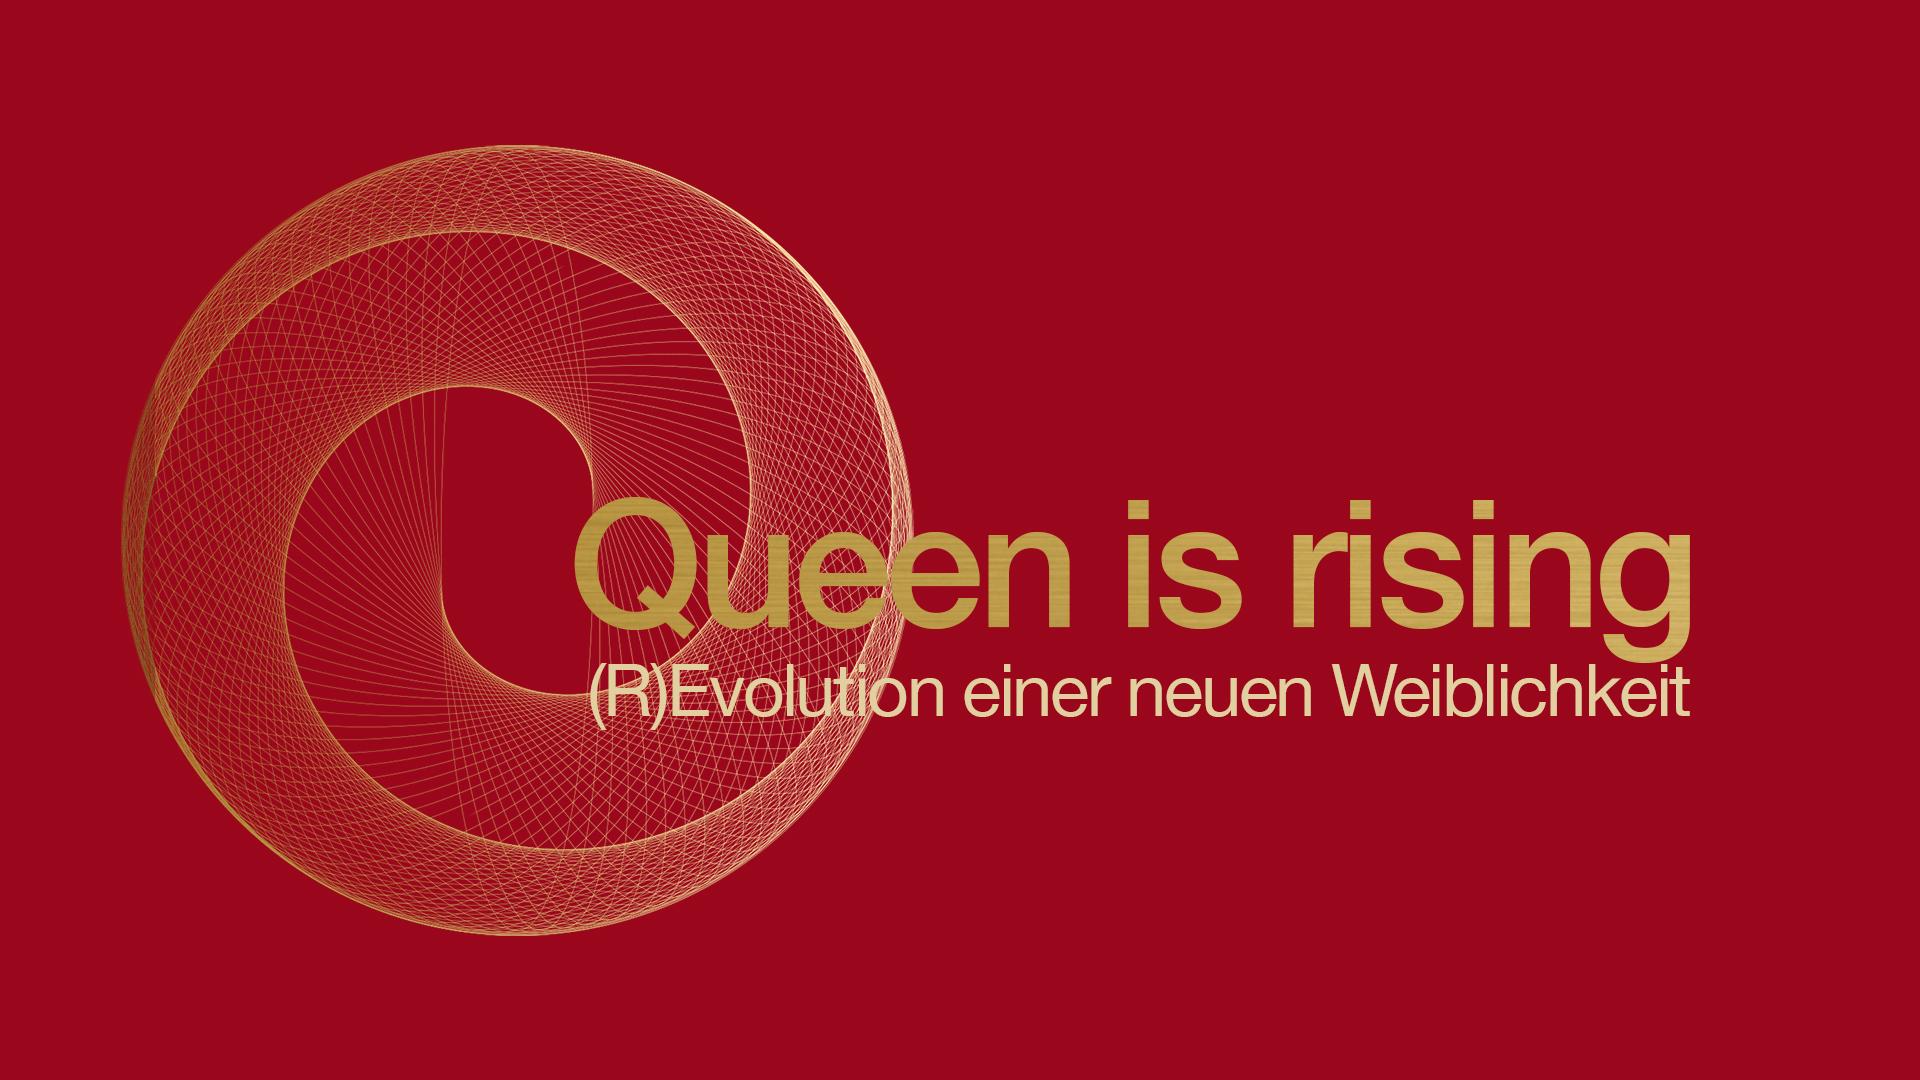 queen-is-rising-16-9-new